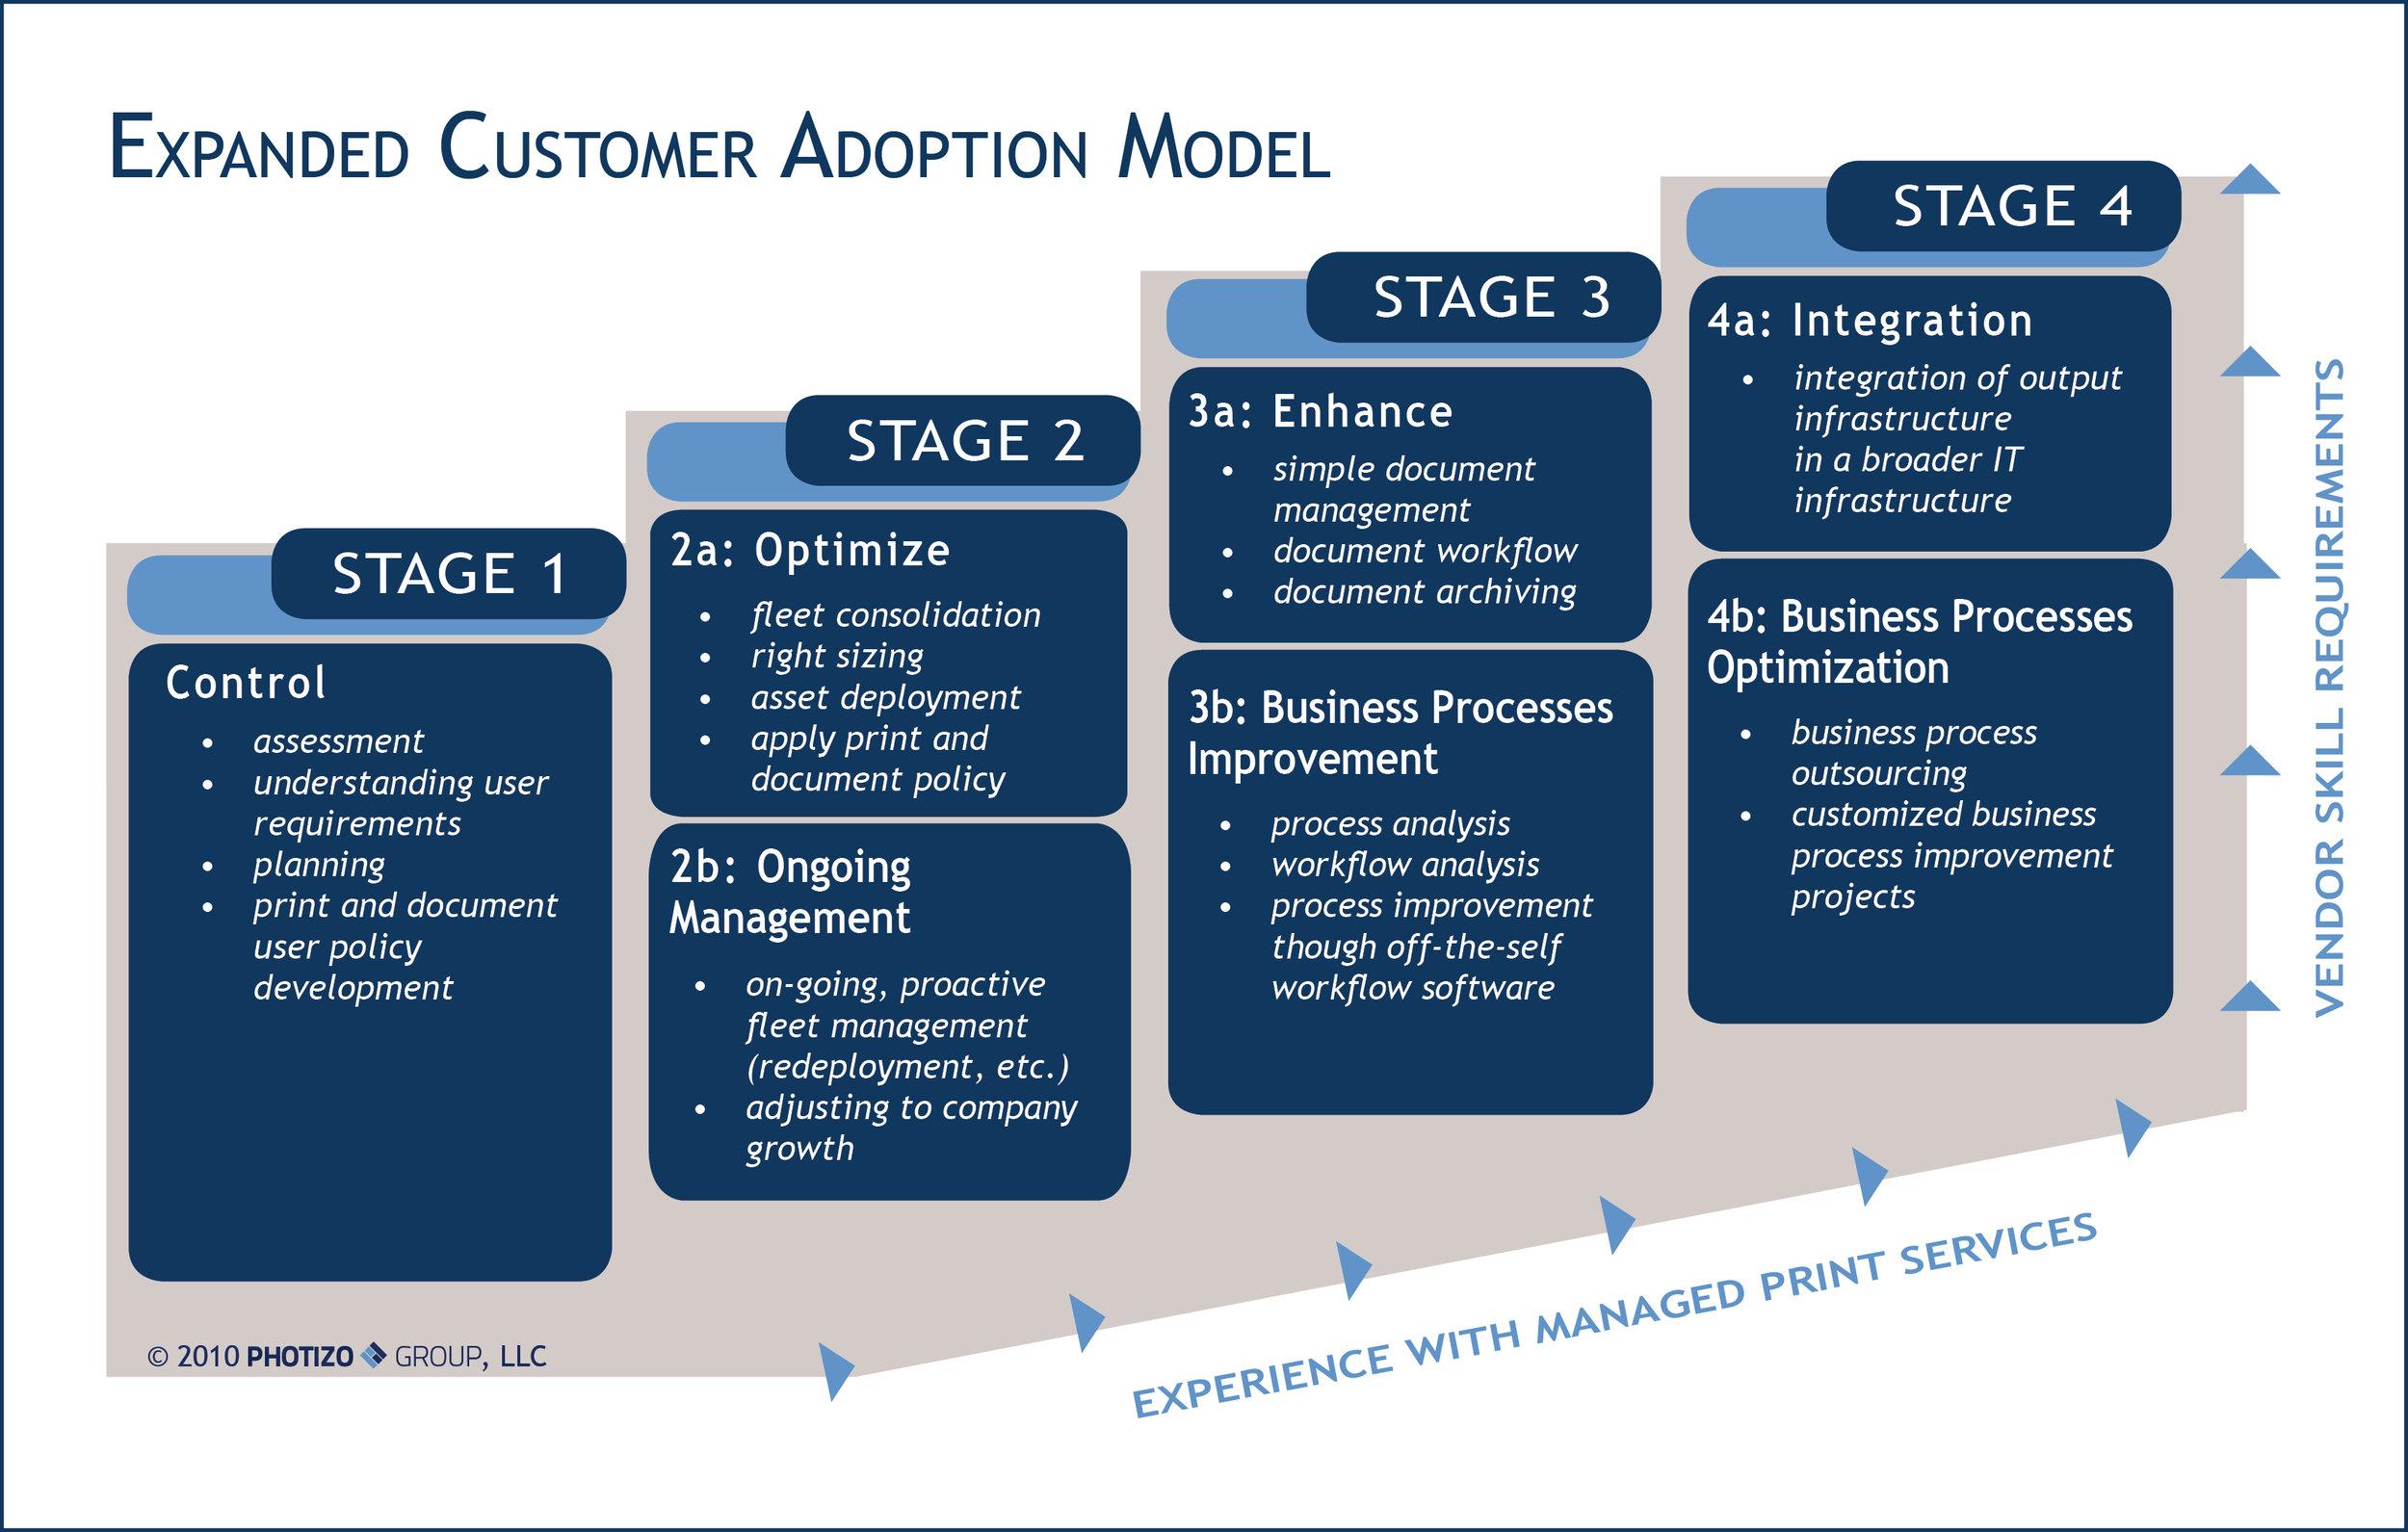 ExpandedCustomerAdoptionModel (4 Stages).jpg